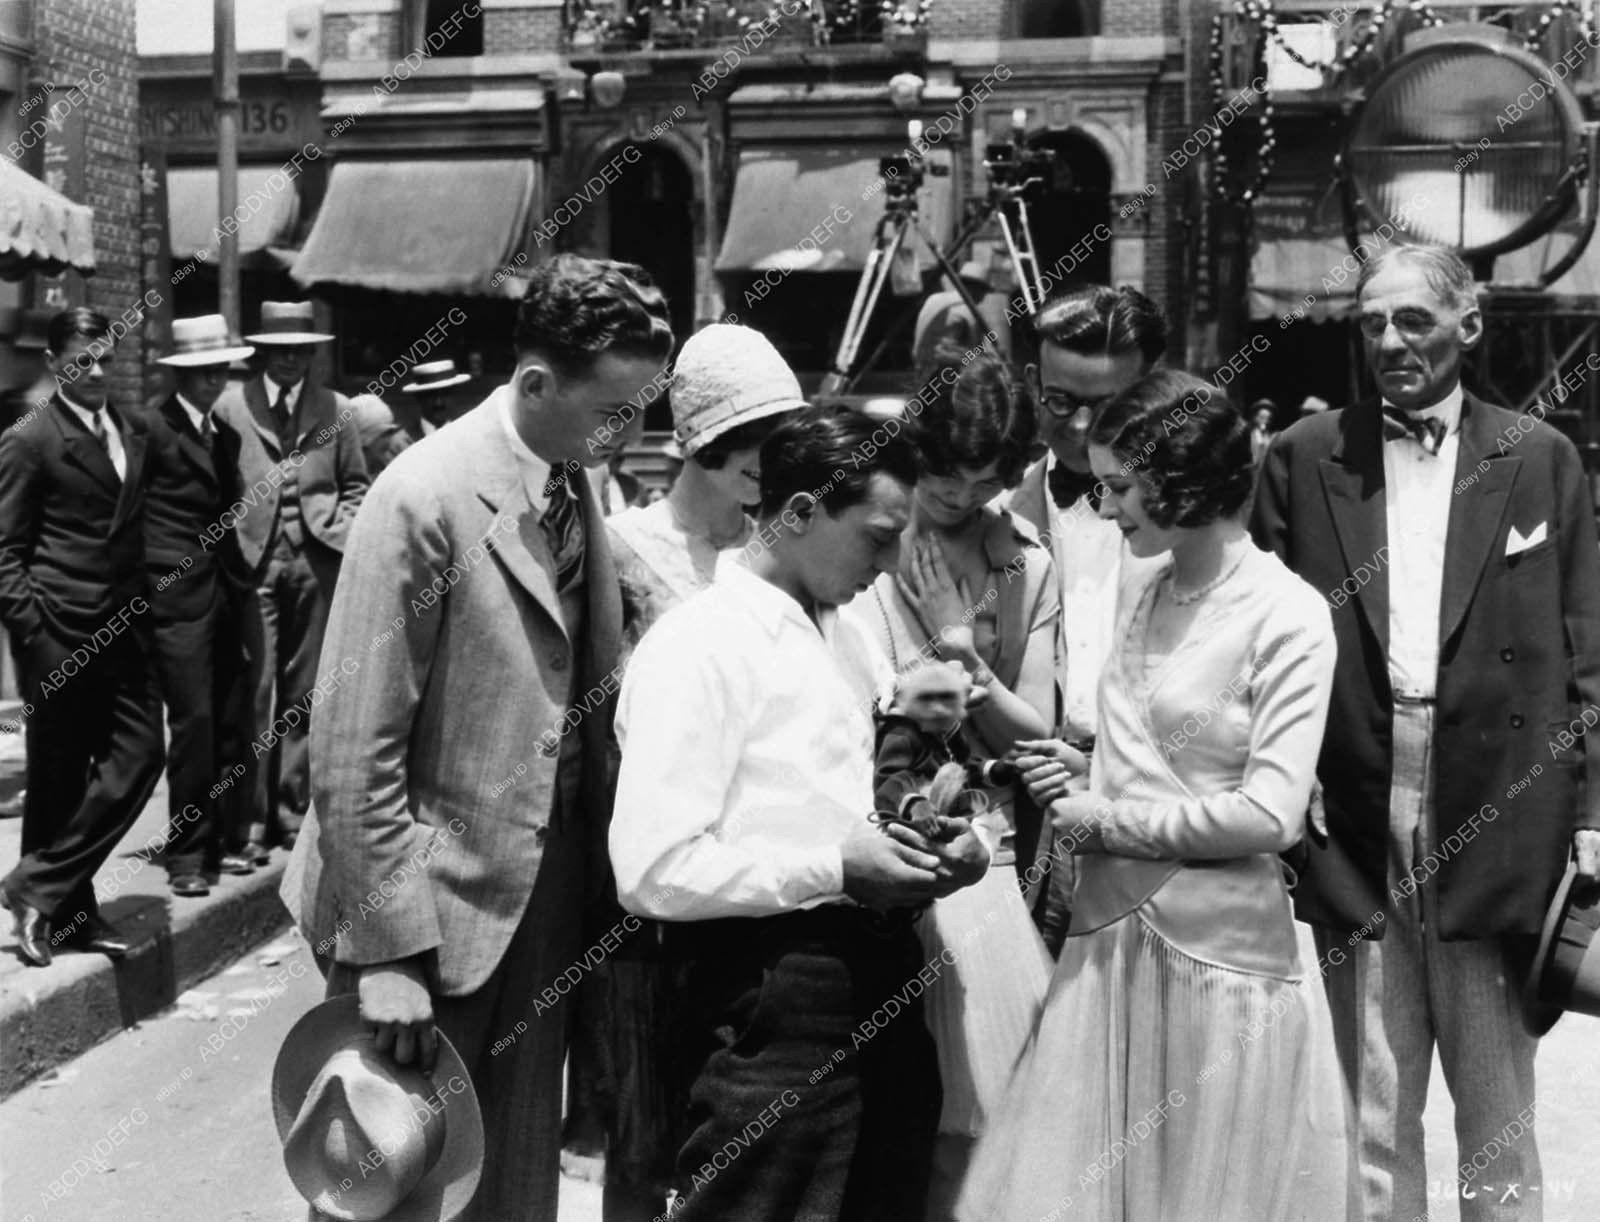 Pic Buster Keaton Film The Cameraman 919 14 Ebay Photo Black And White Movie Film